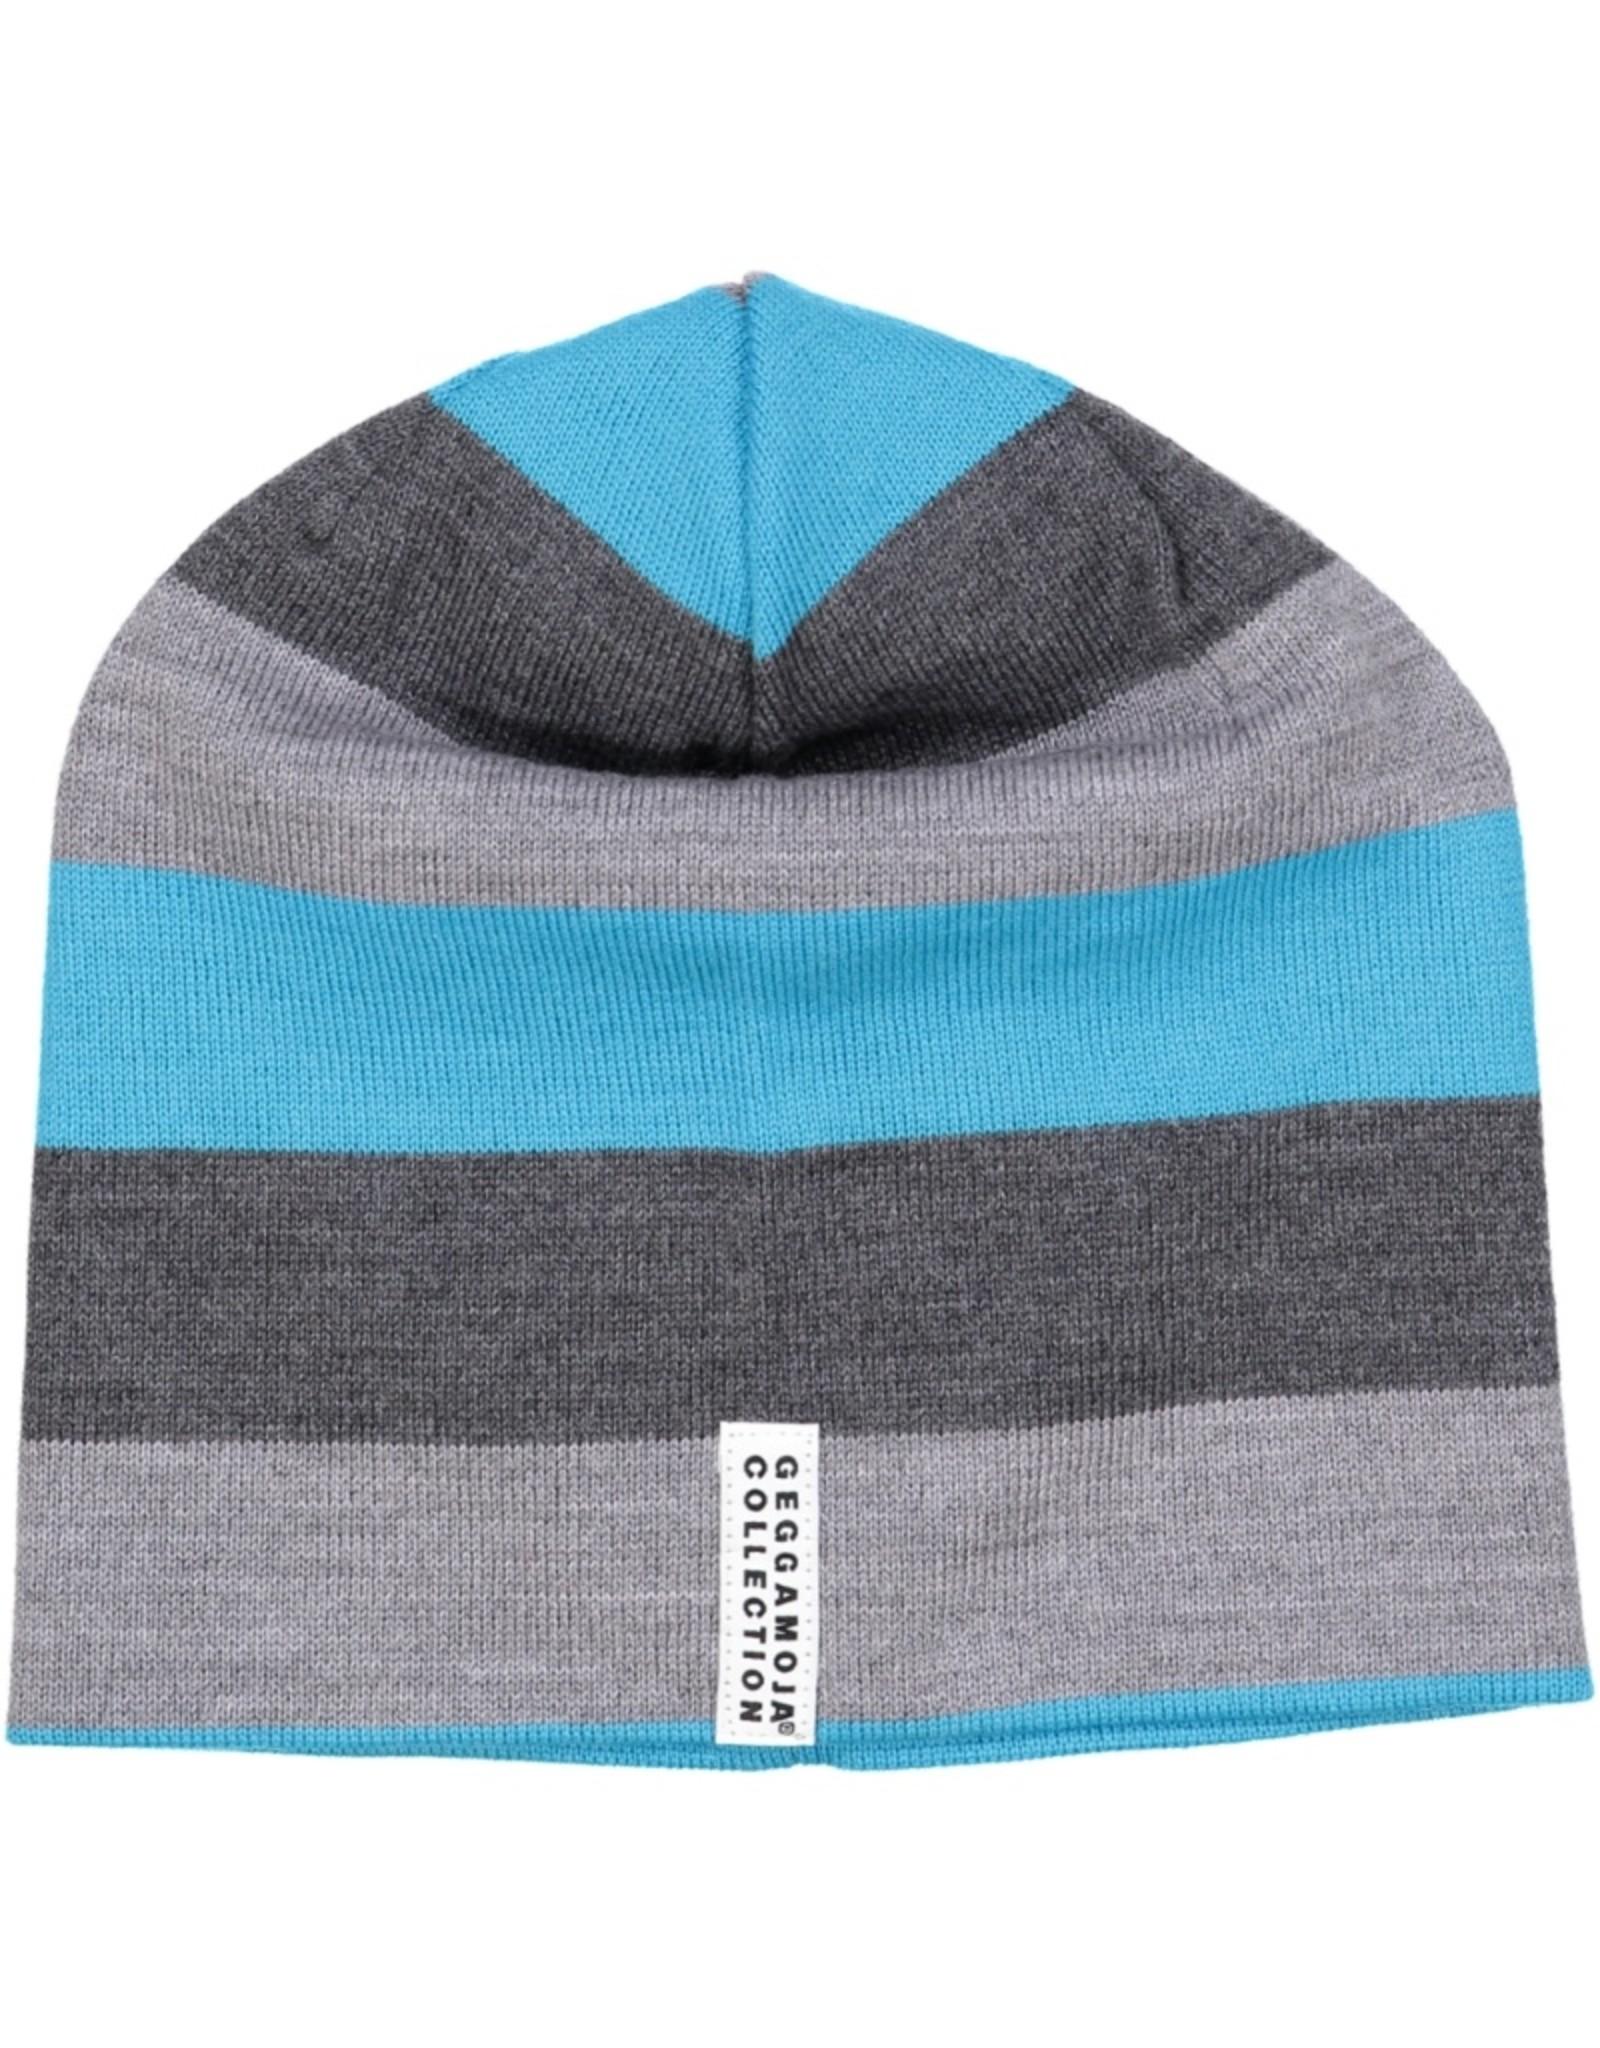 Geggamoja Wollen muts - grijs blauw